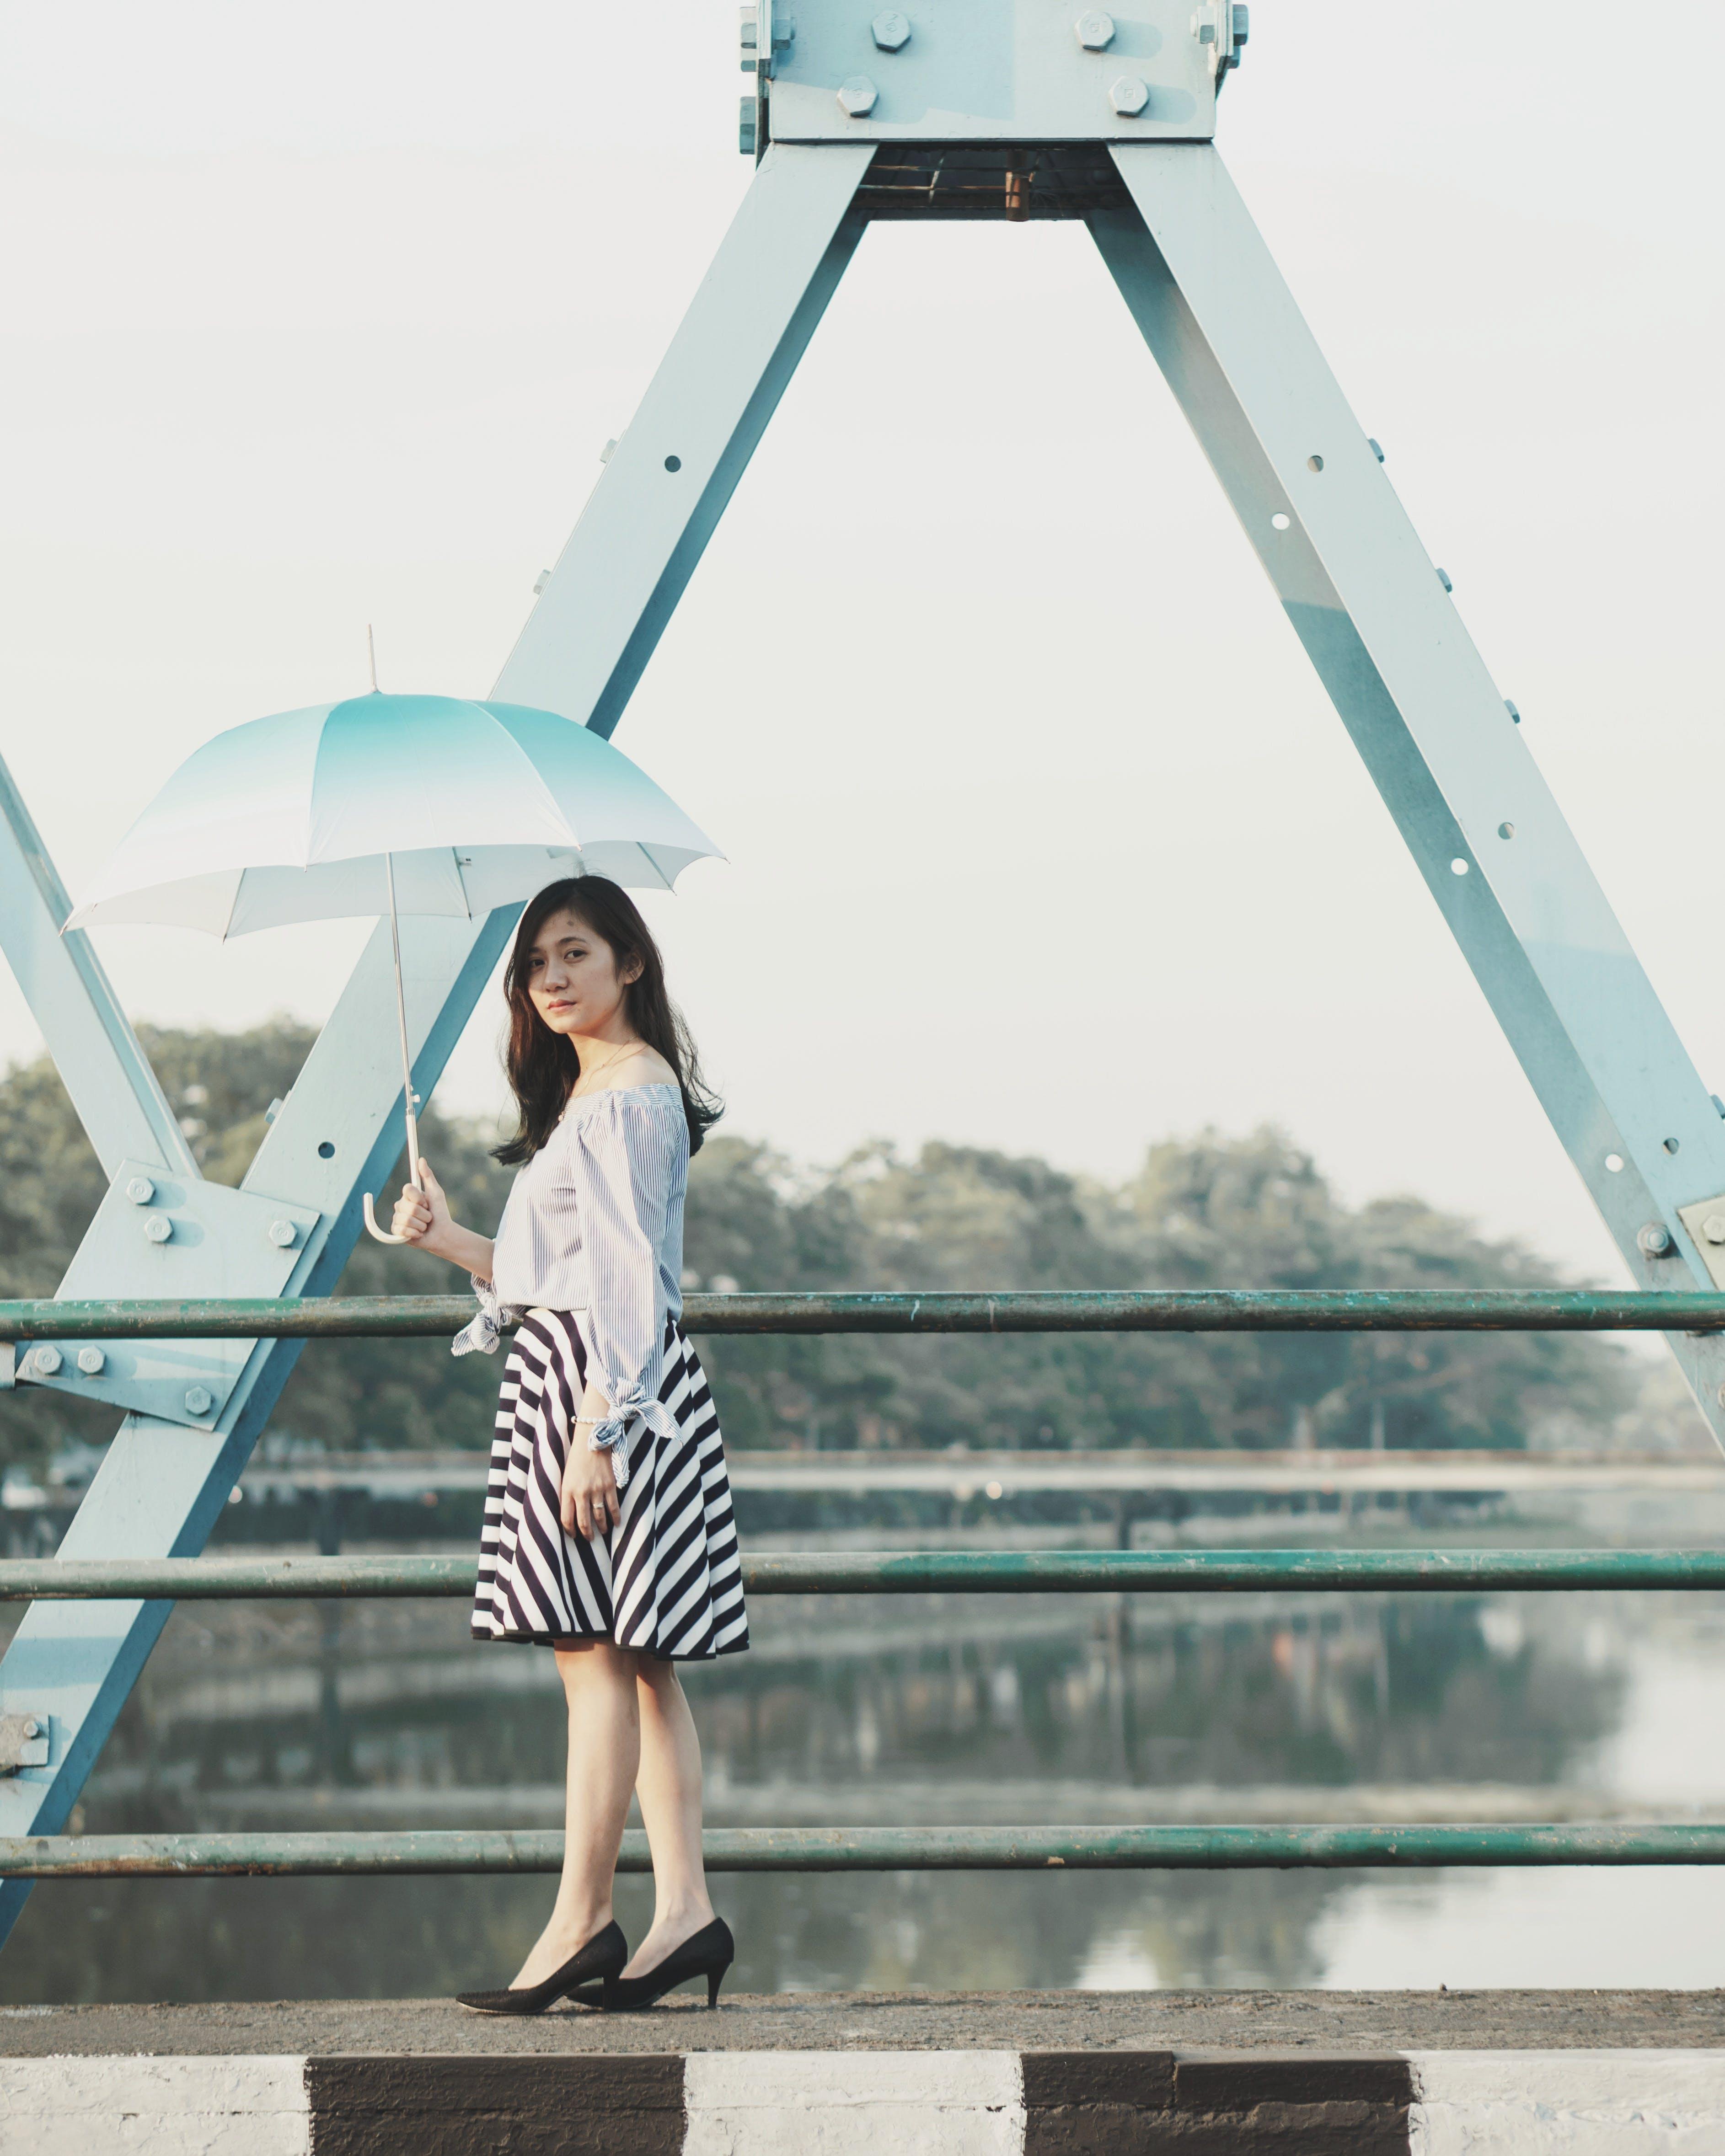 Photo of Woman Holding Umbrella on Bridge